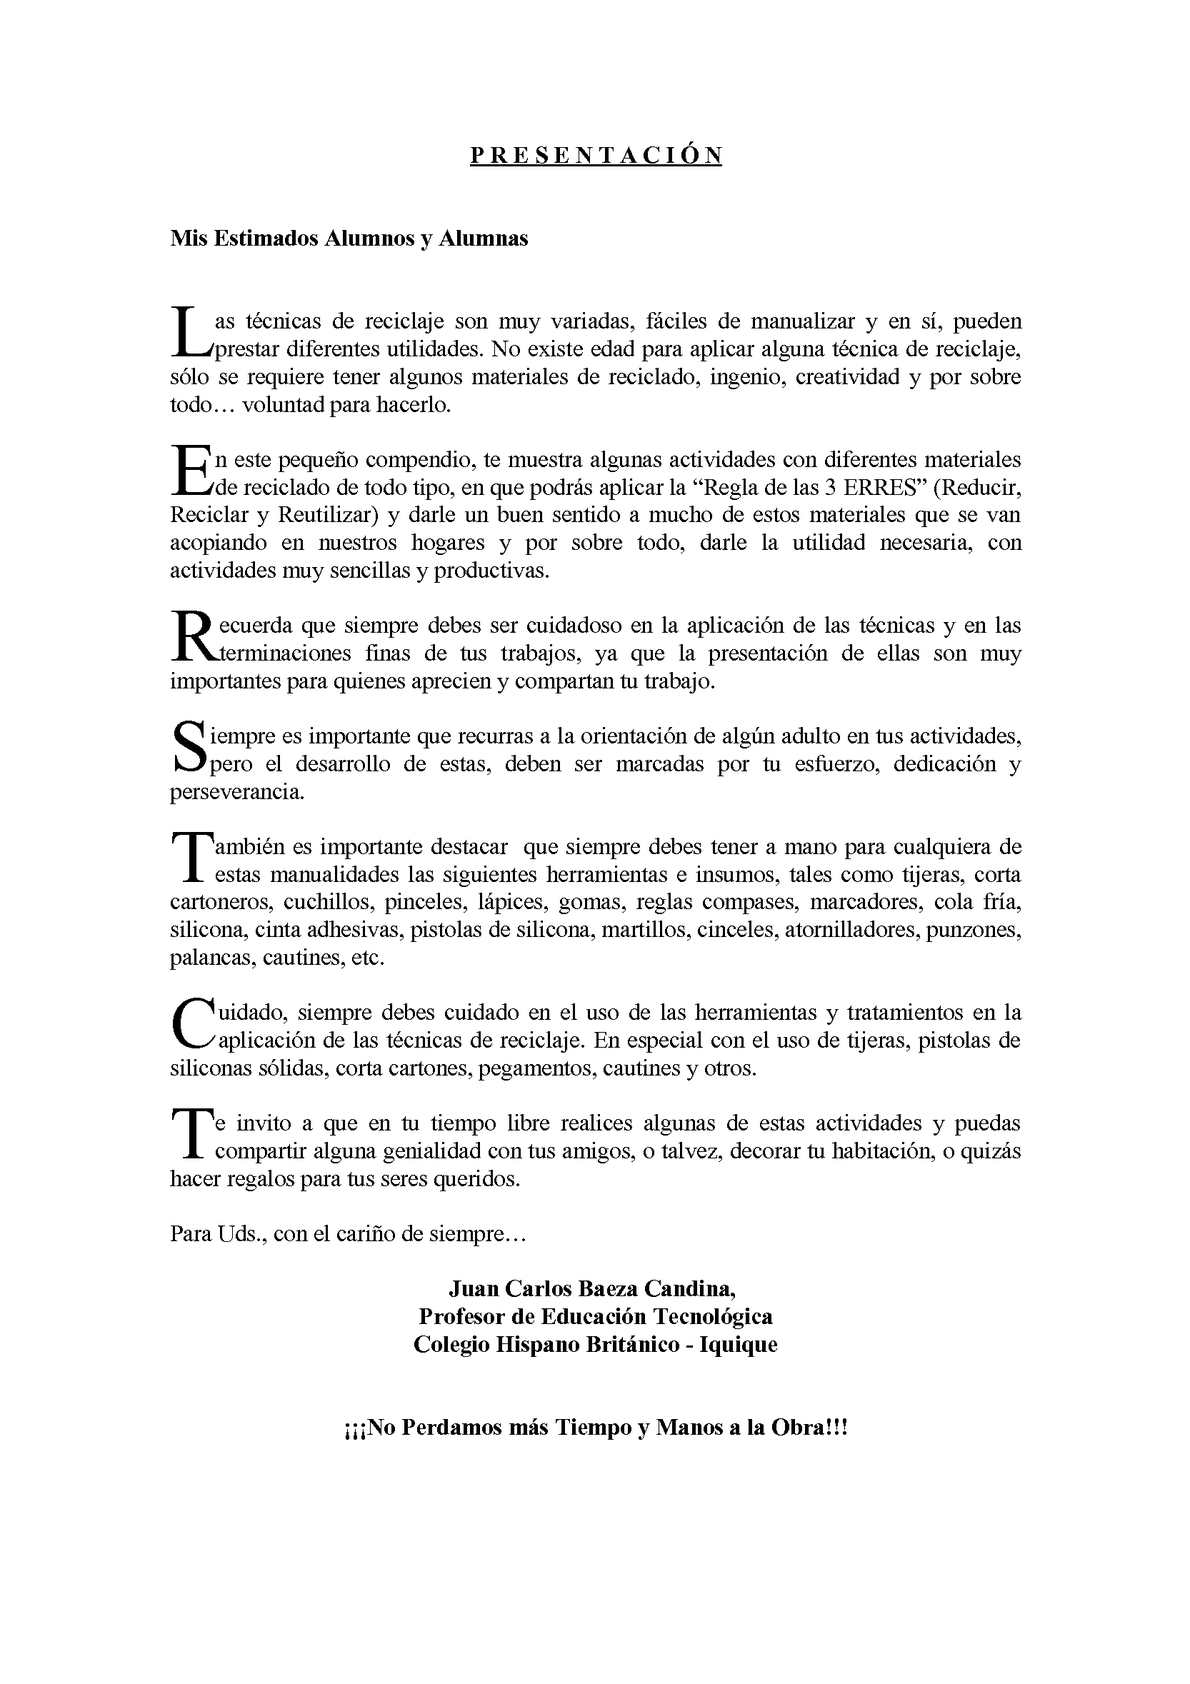 Calaméo - Objetos Tecnológicos de Baja Manufactura